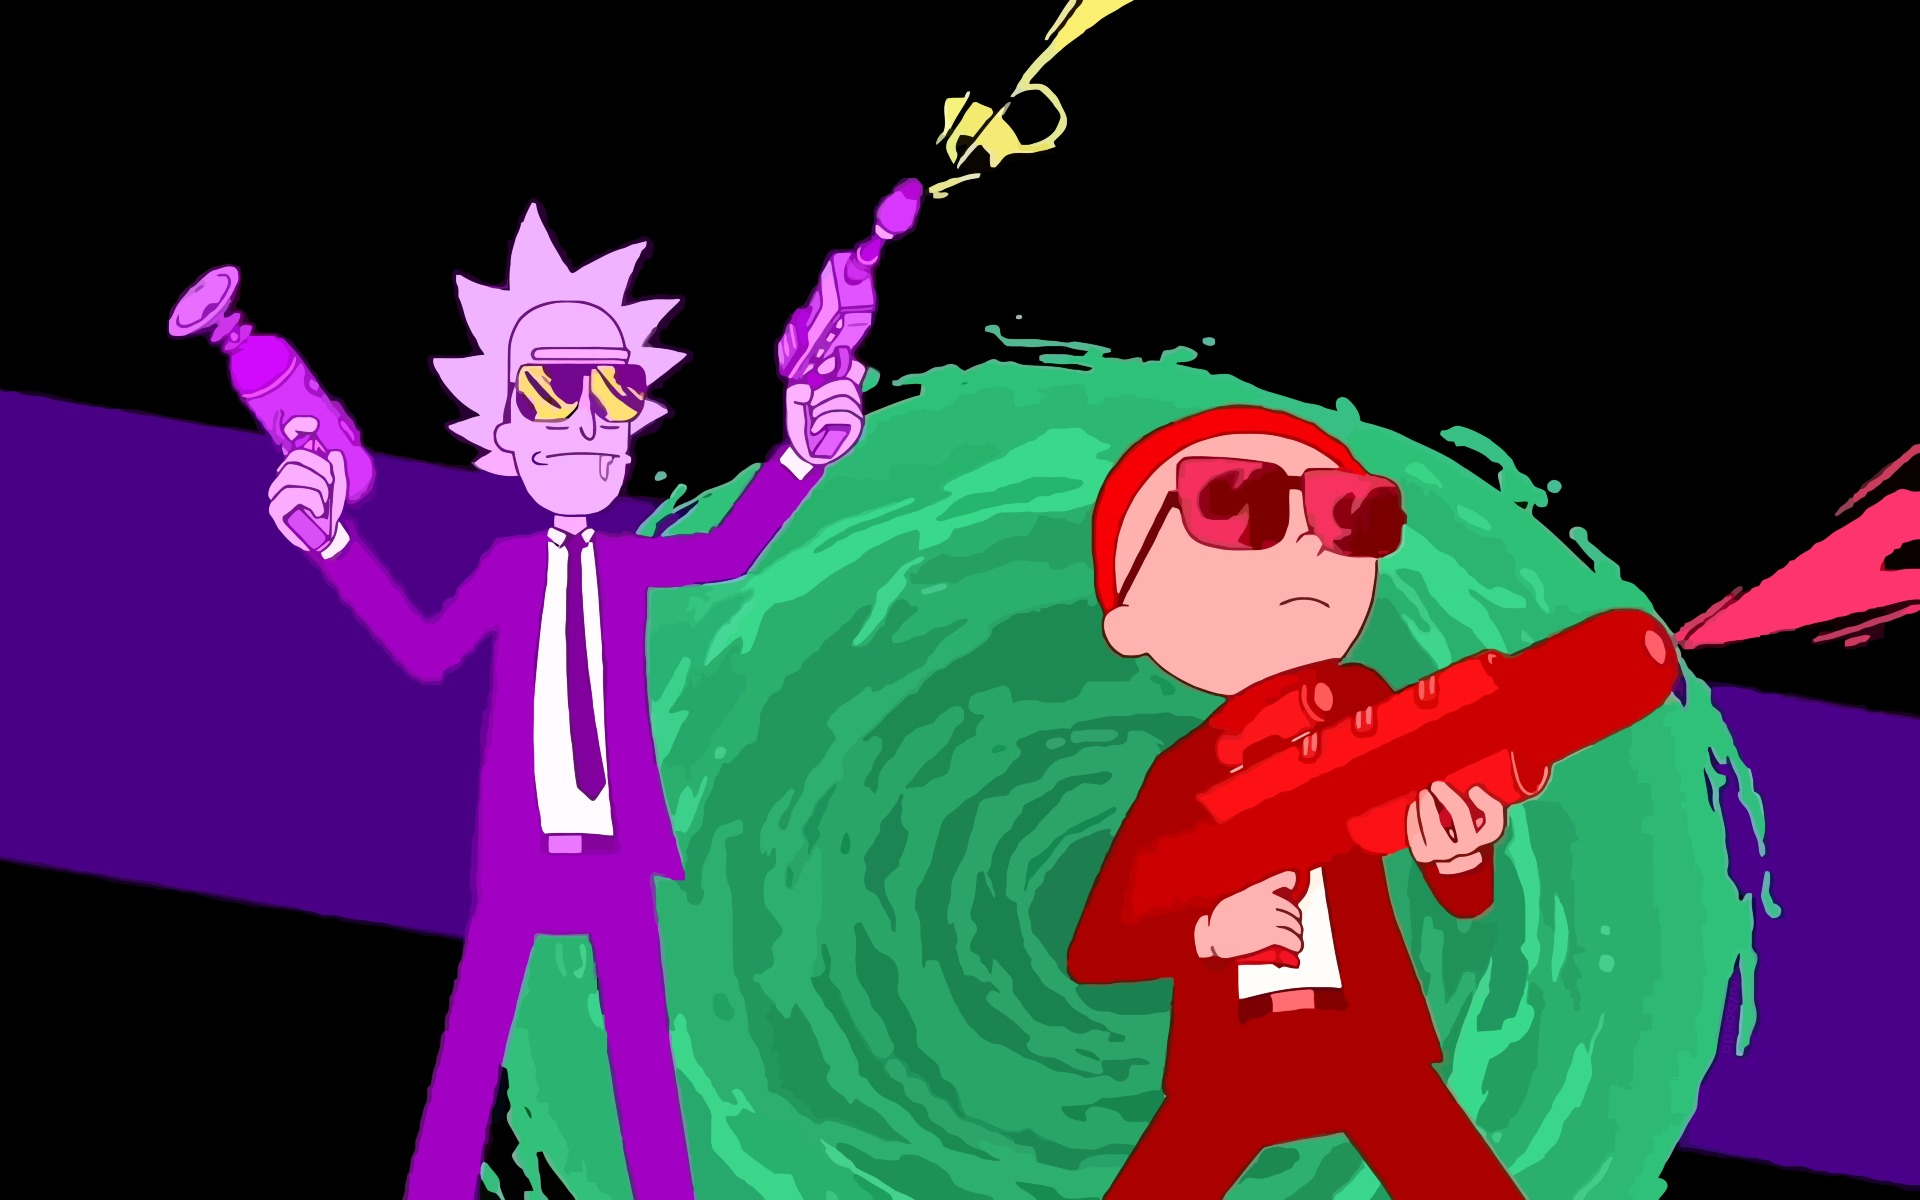 Rick And Morty Run The Jewels Art, HD 8K Wallpaper